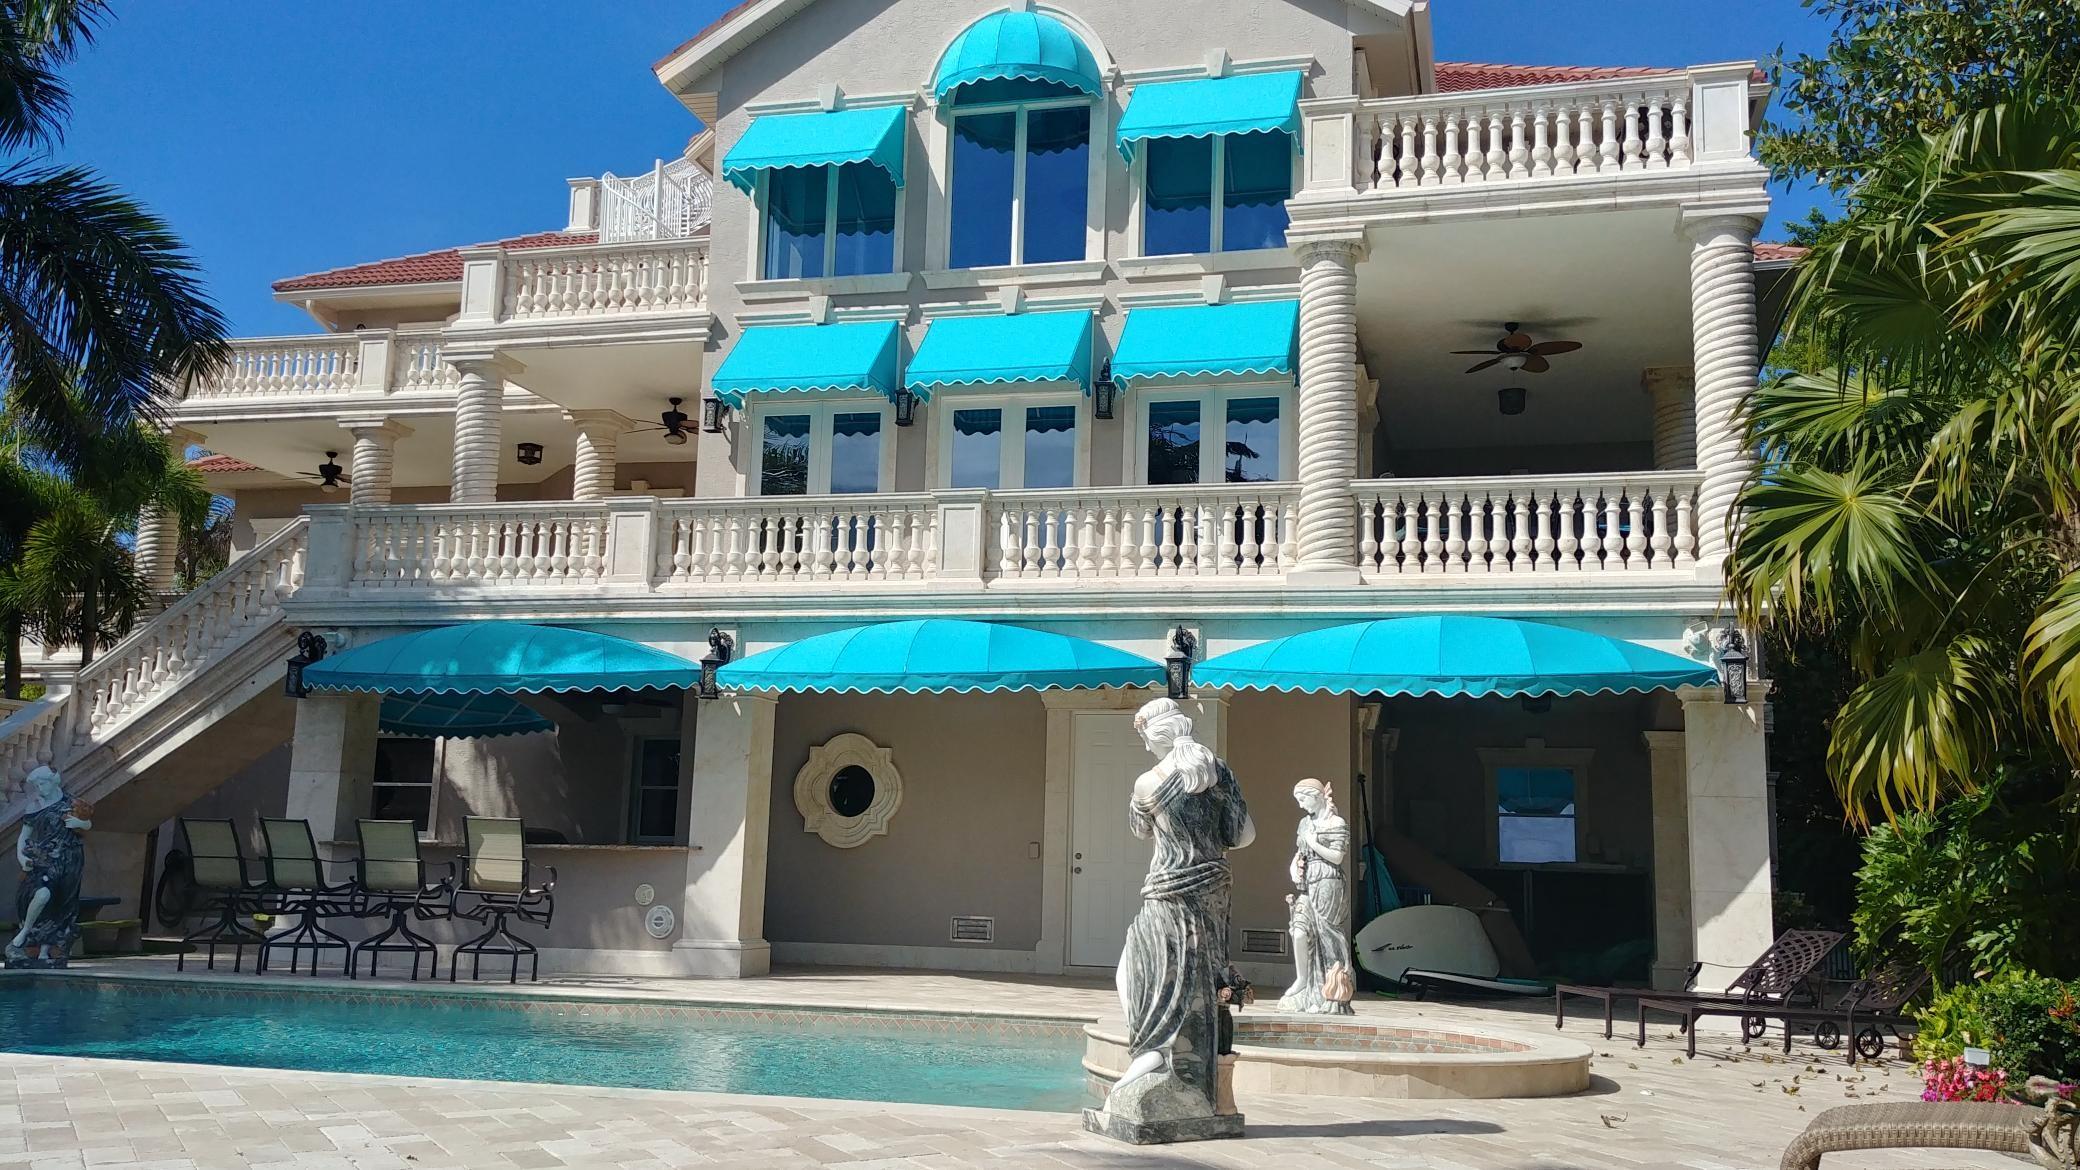 279 Casey Key Resort Awning